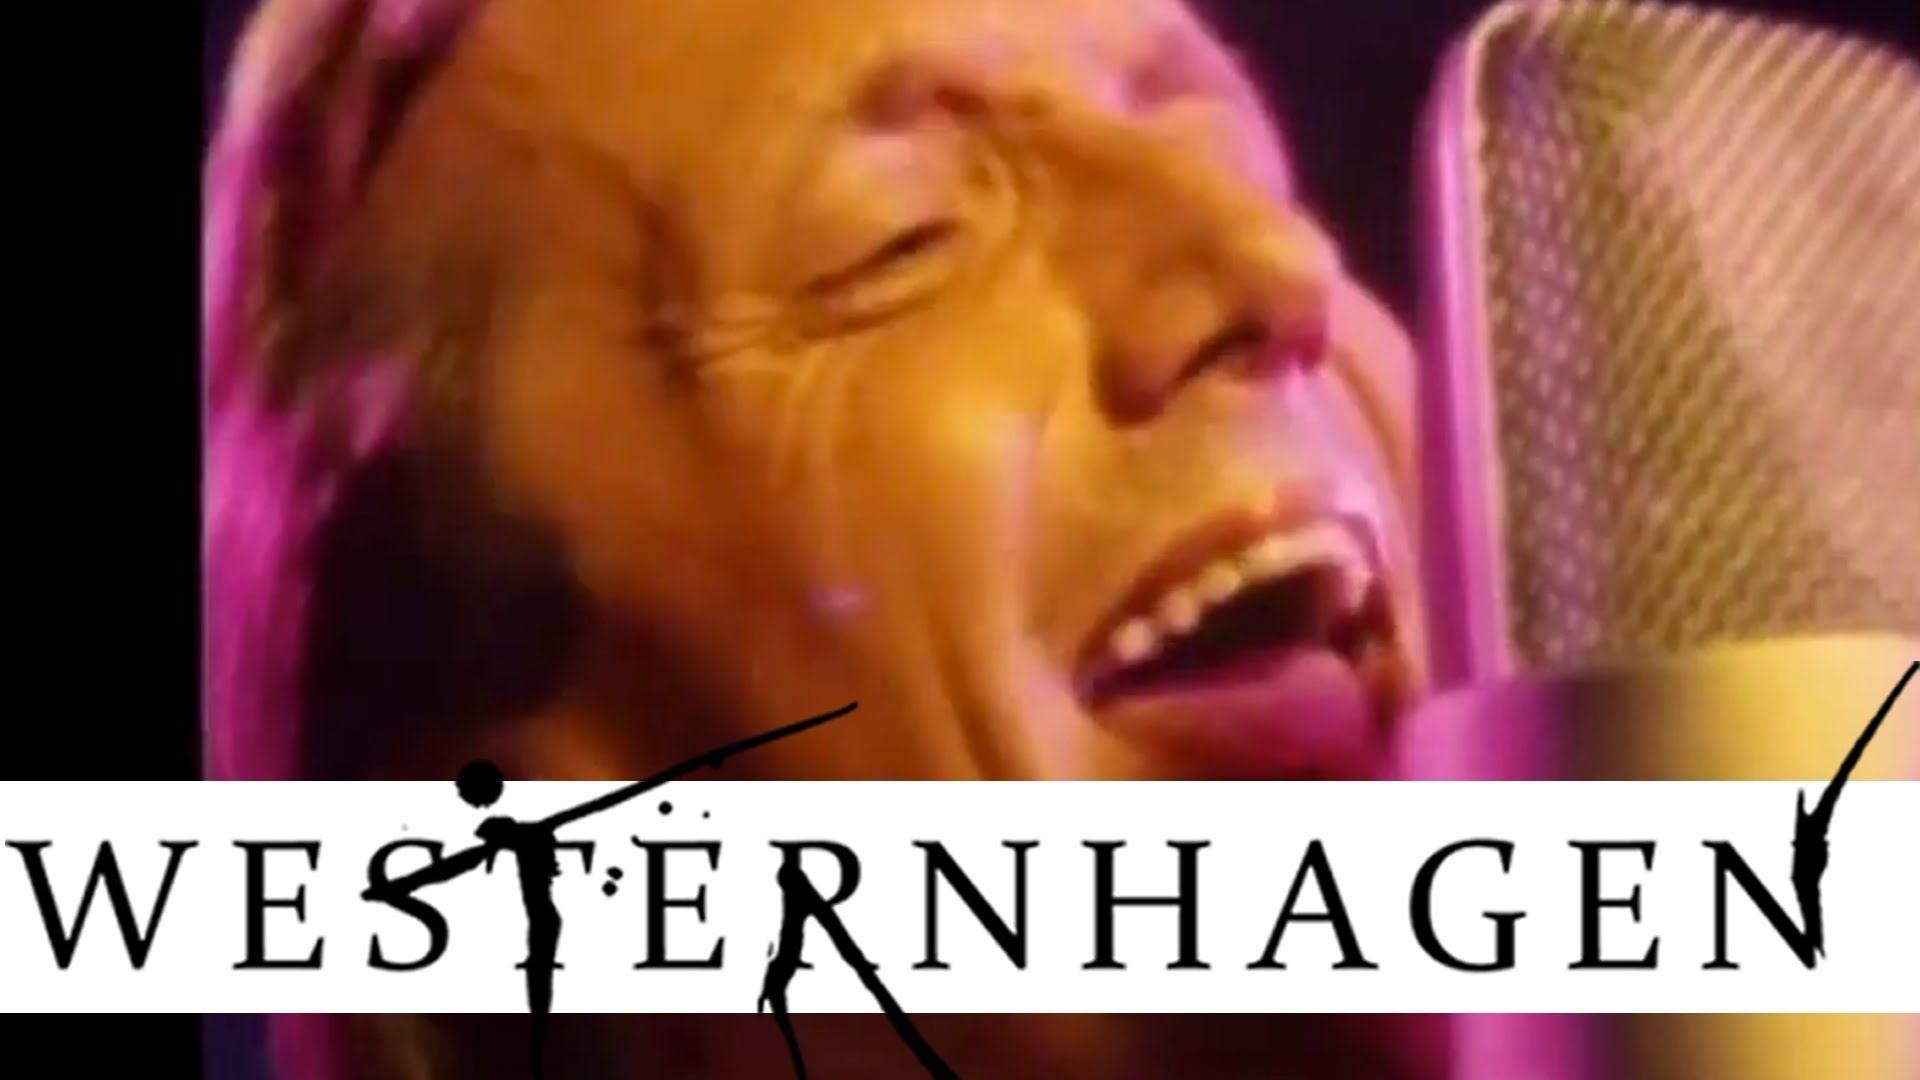 Marius Müller Westernhagen Sexy Official Video Musik Deutsch